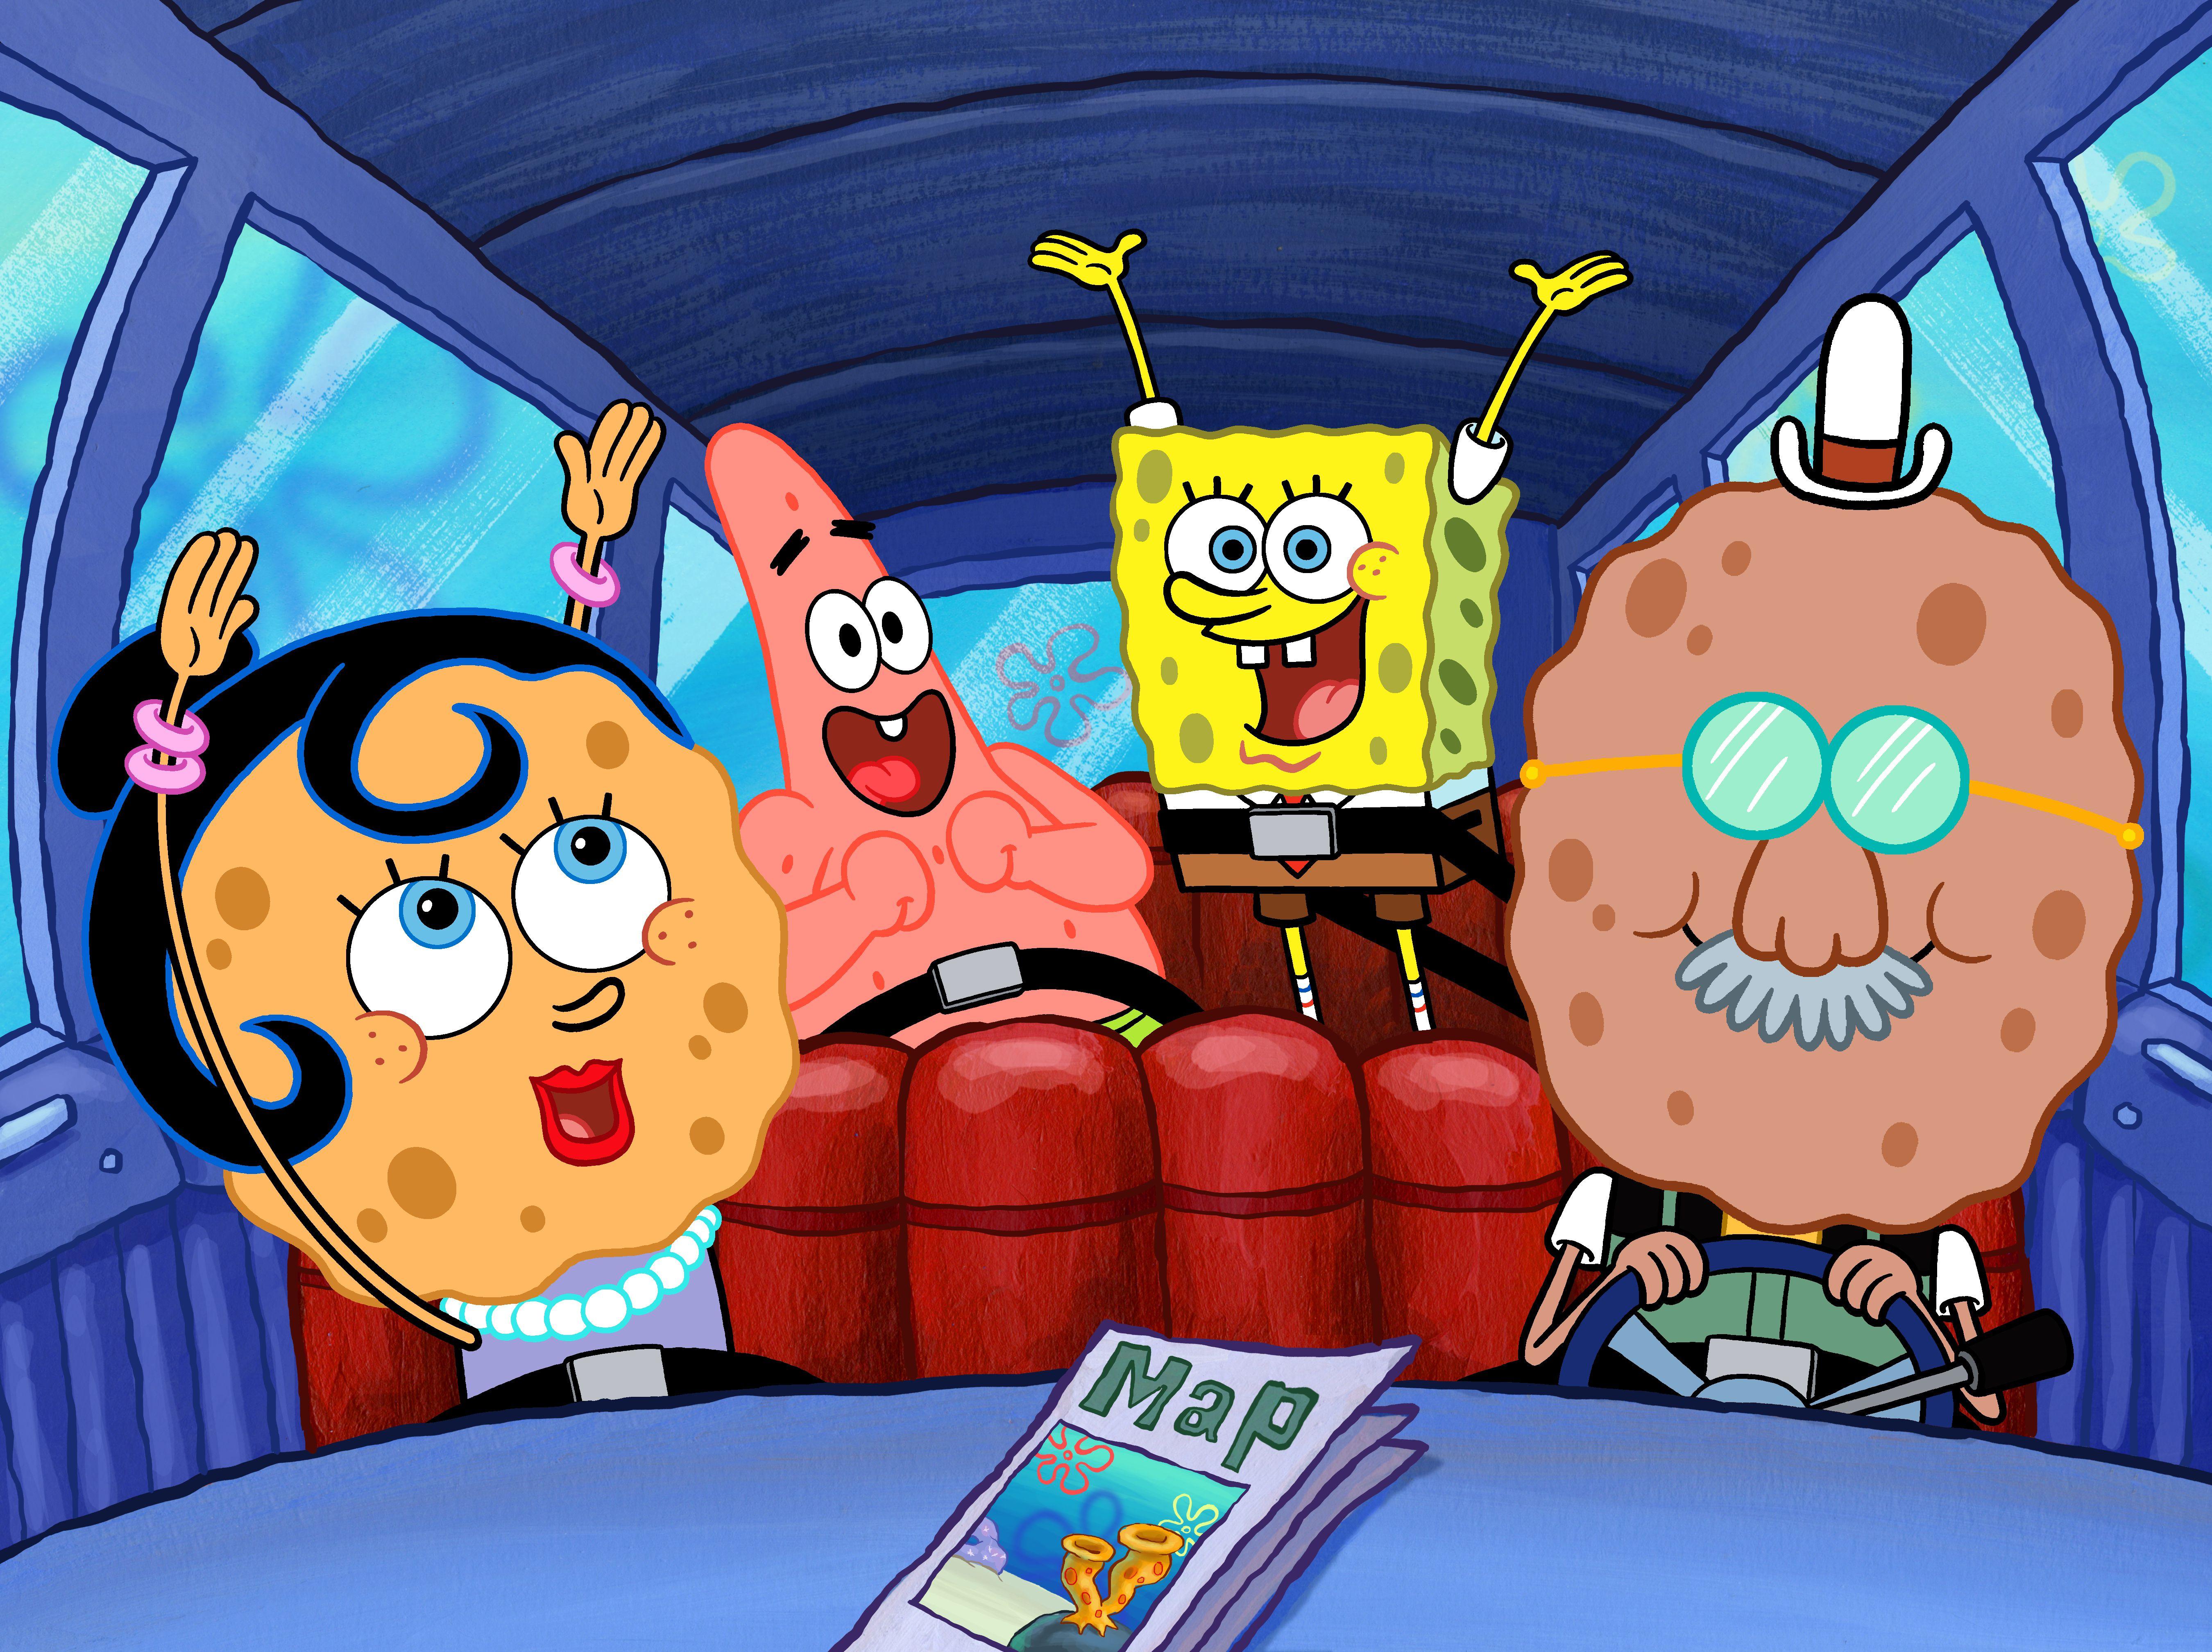 SpongeBob SquarePants - SpongeBob's Family Vacation